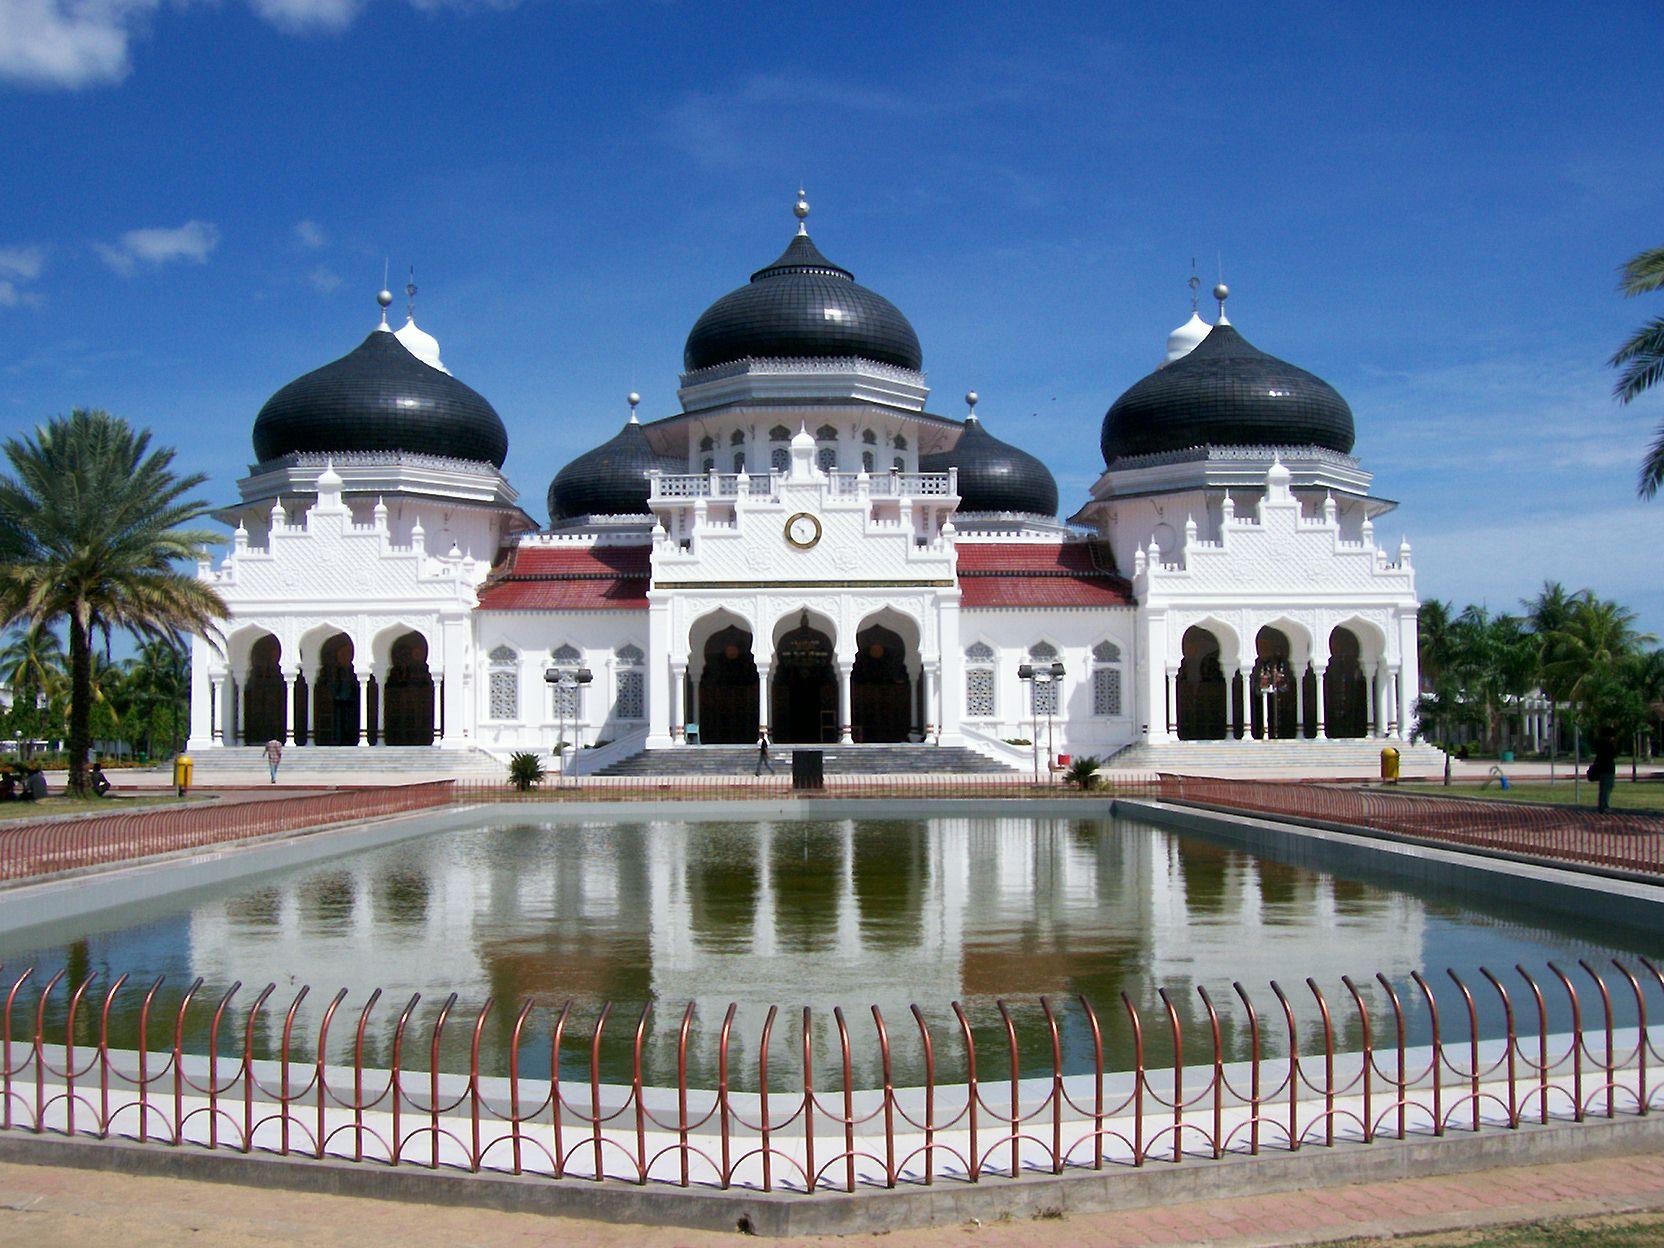 Daftar Masjid Aceh Wikiwand Baiturrahim Ulee Lheue Kota Banda